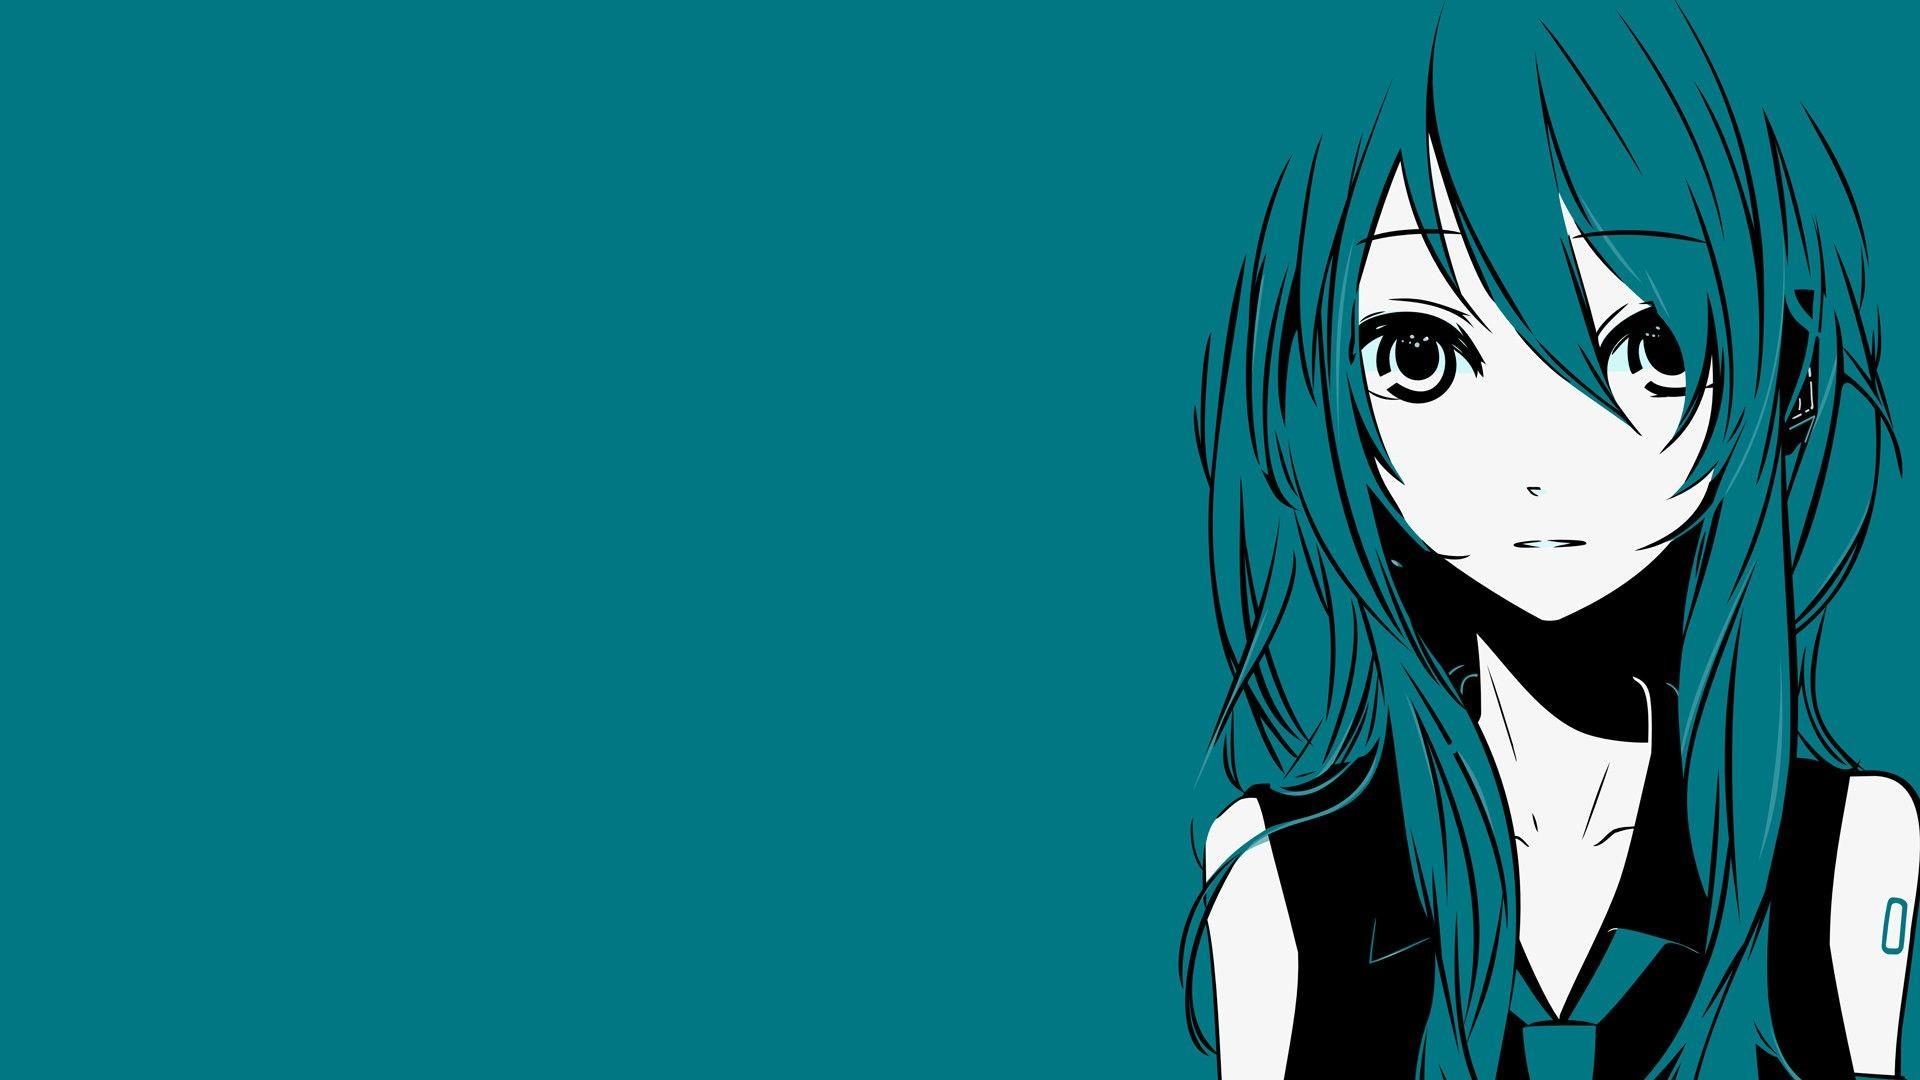 x Anime Wallpapers Wallpaper